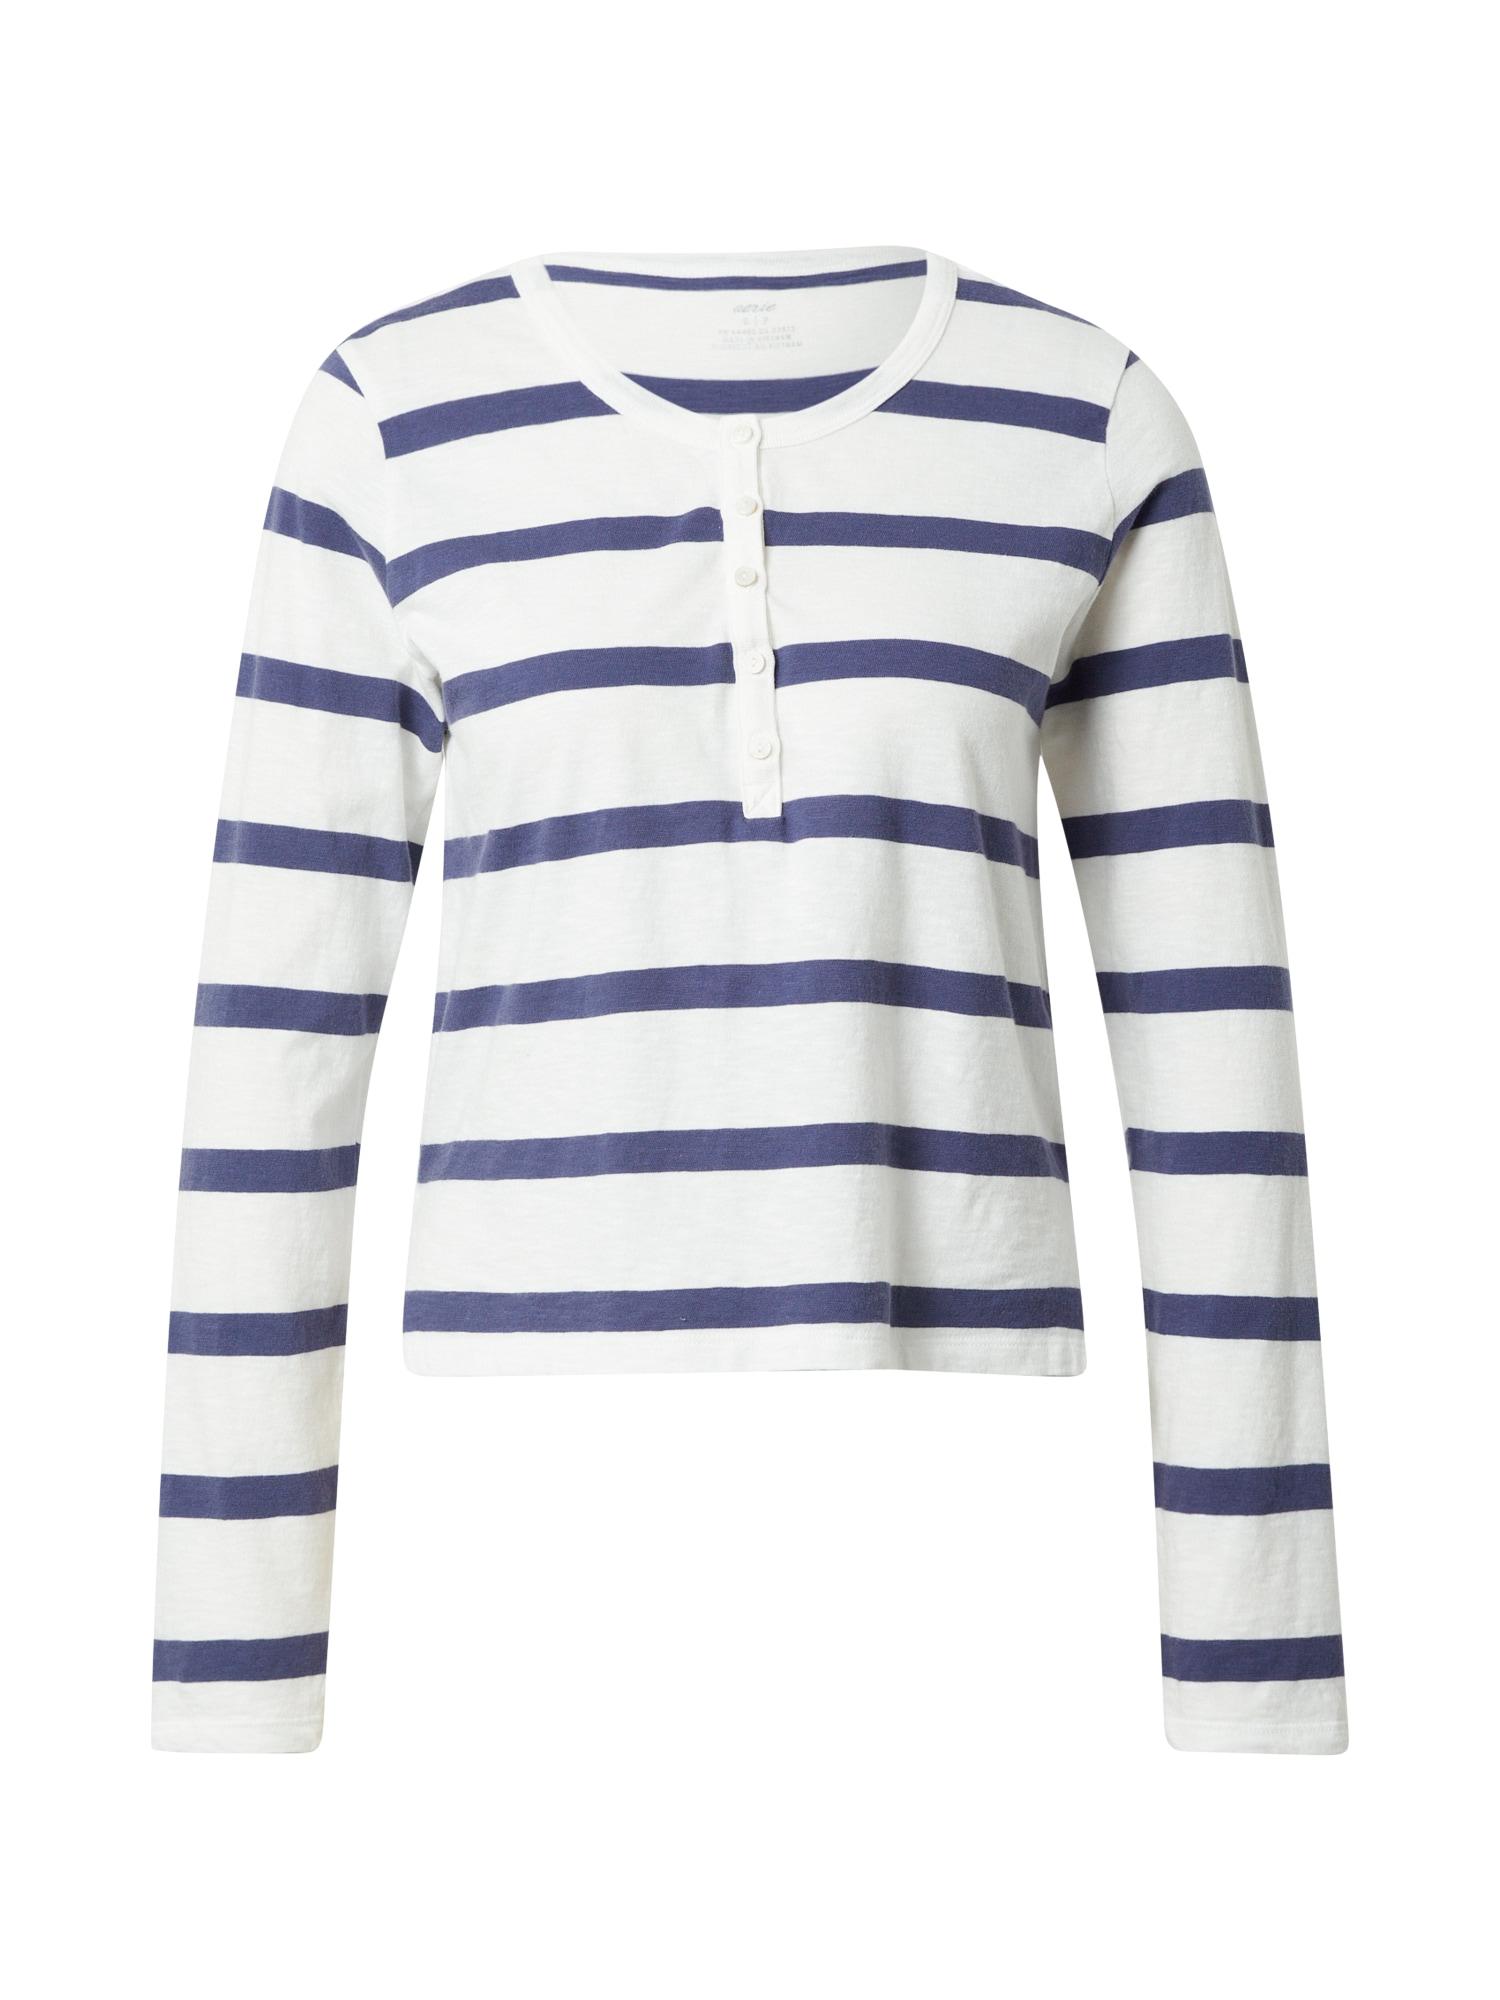 AERIE Marškinėliai mėlyna / balta